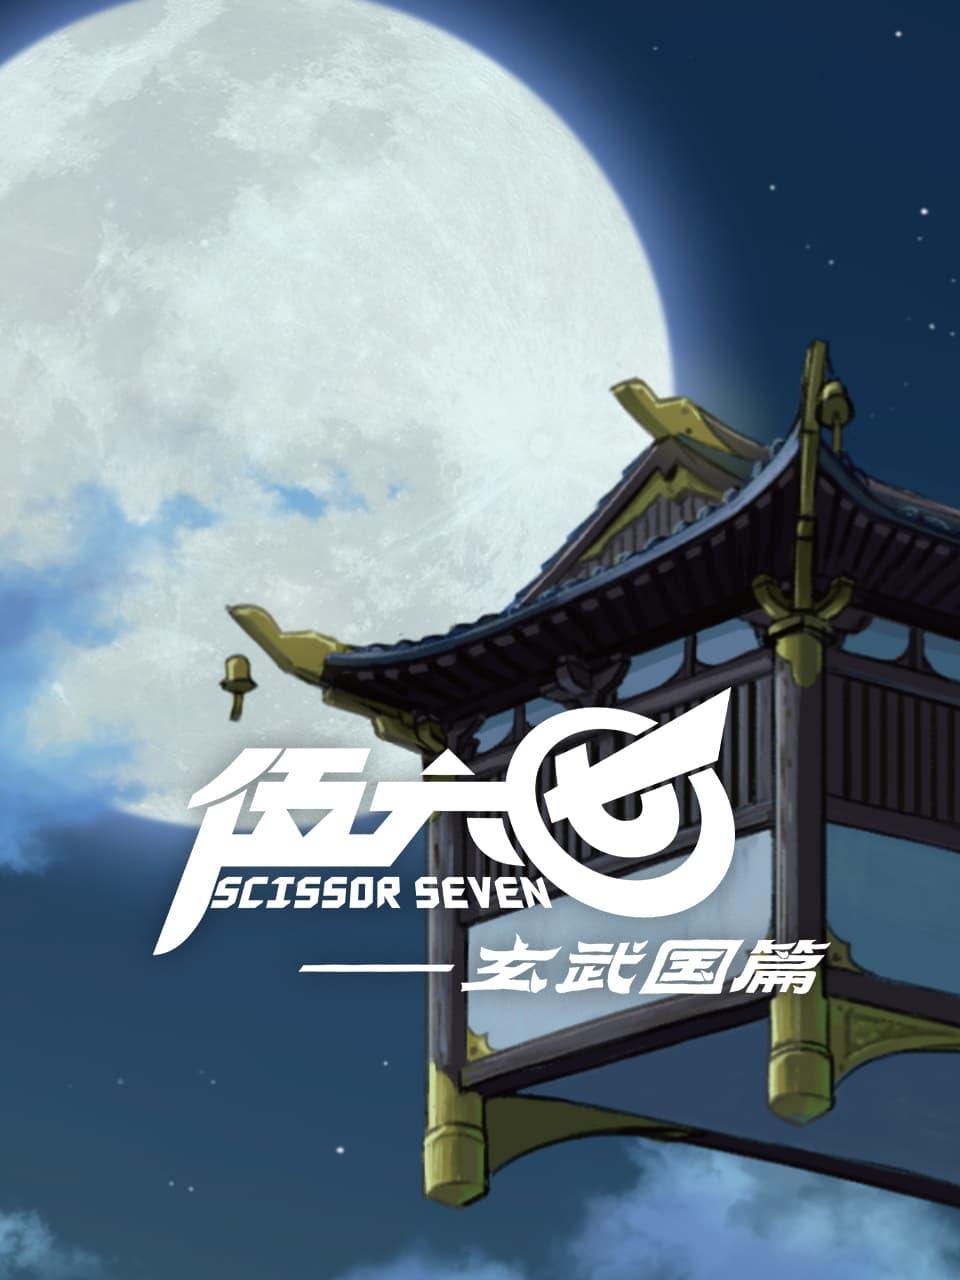 Scissor Seven เซเว่น นักฆ่ากรรไกร (ภาค3) ซับไทย ตอนที่ 1-10 จบแล้ว